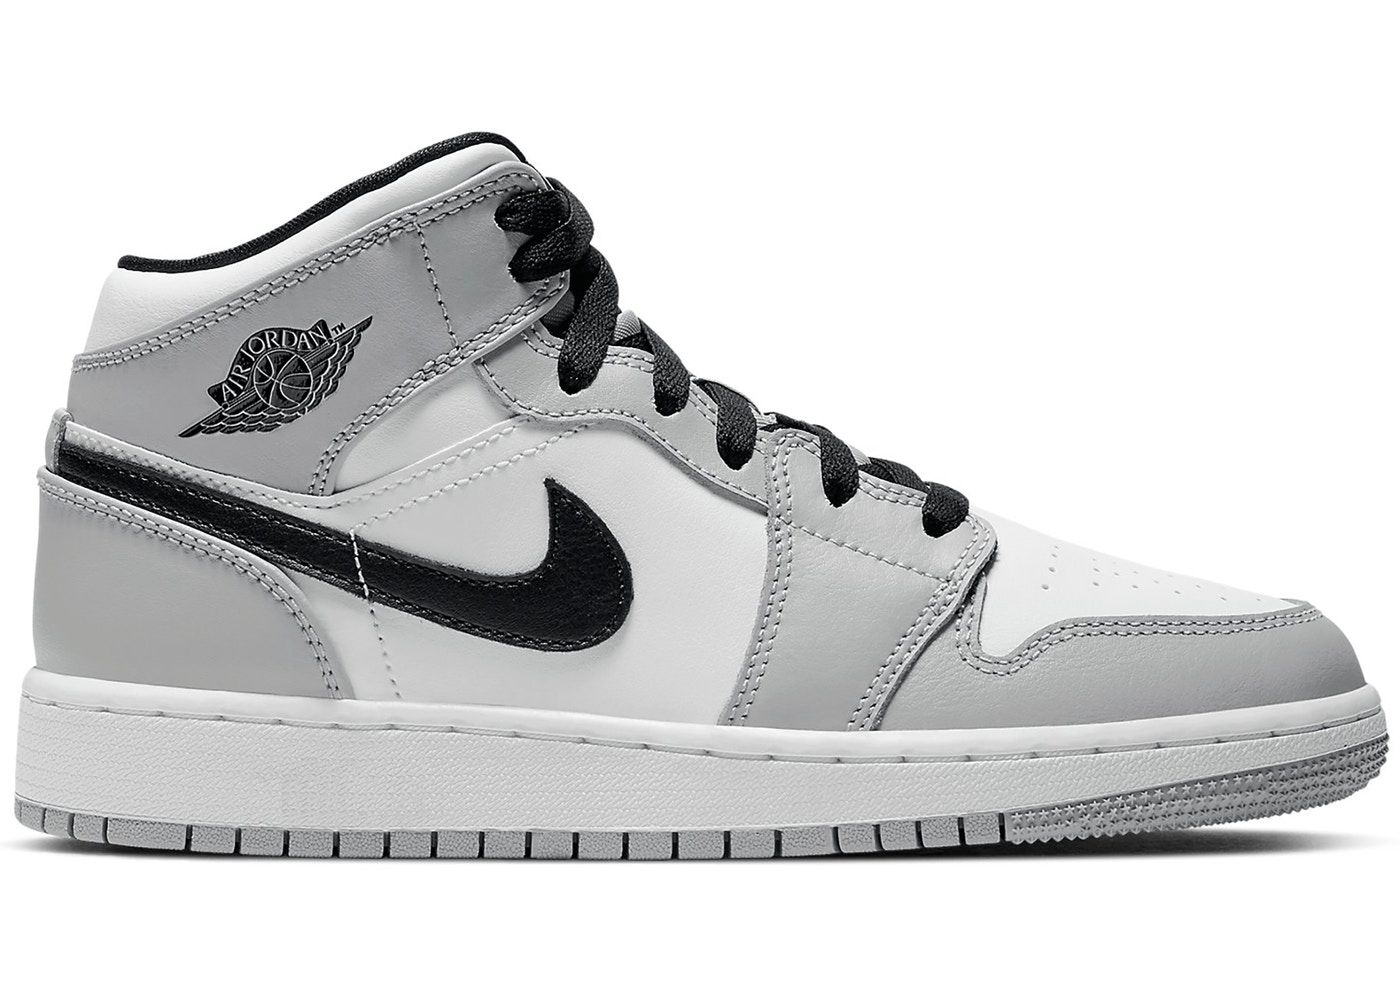 Jordan 1 Mid Light Smoke Grey Gs Jordan Shoes Girls Jordan 1 Mid Sneakers